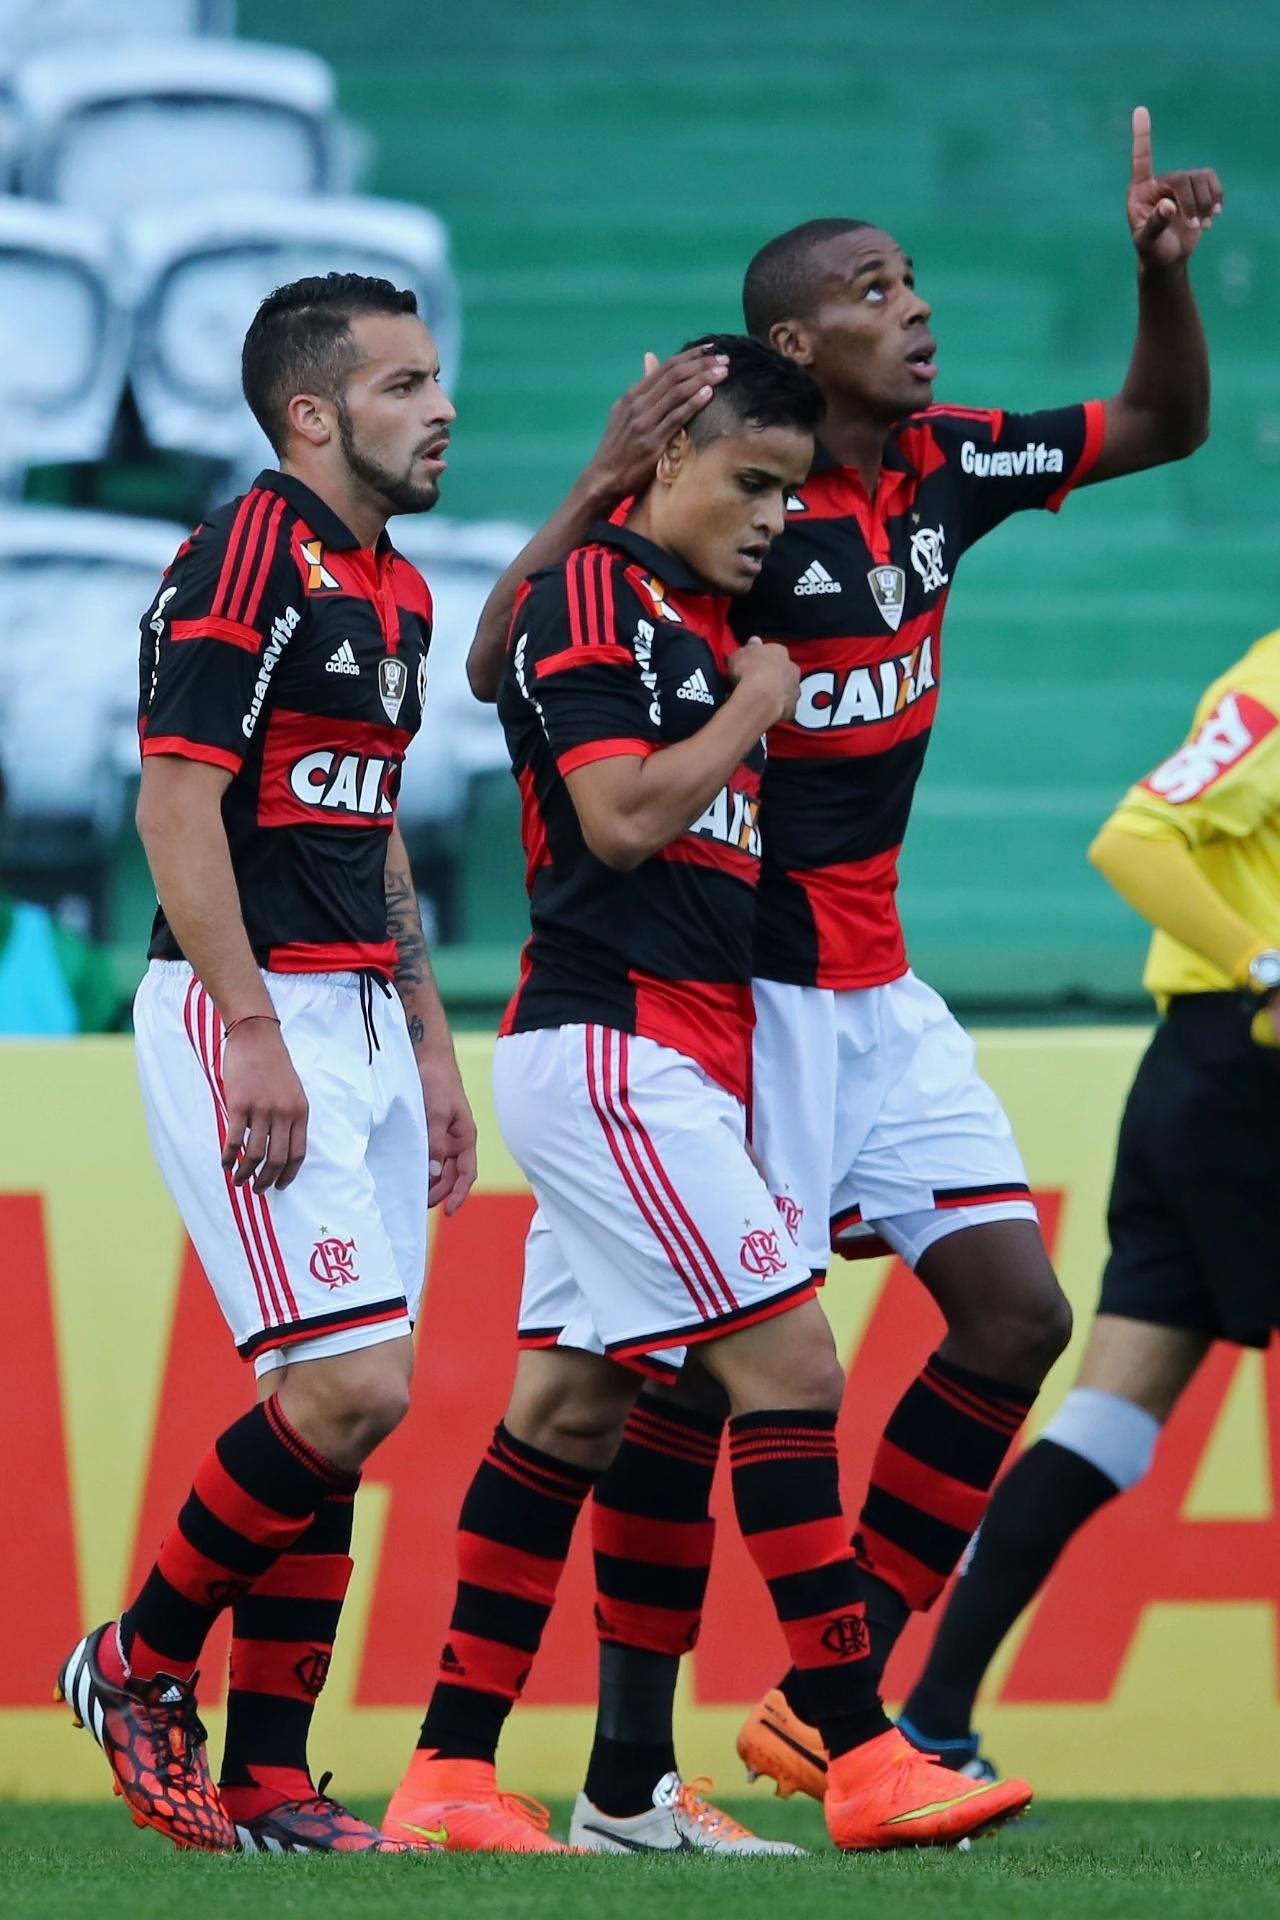 Jogadores do Flamengo comemoram o gol marcado por Éverton (c) durante o jogo contra o Coritiba